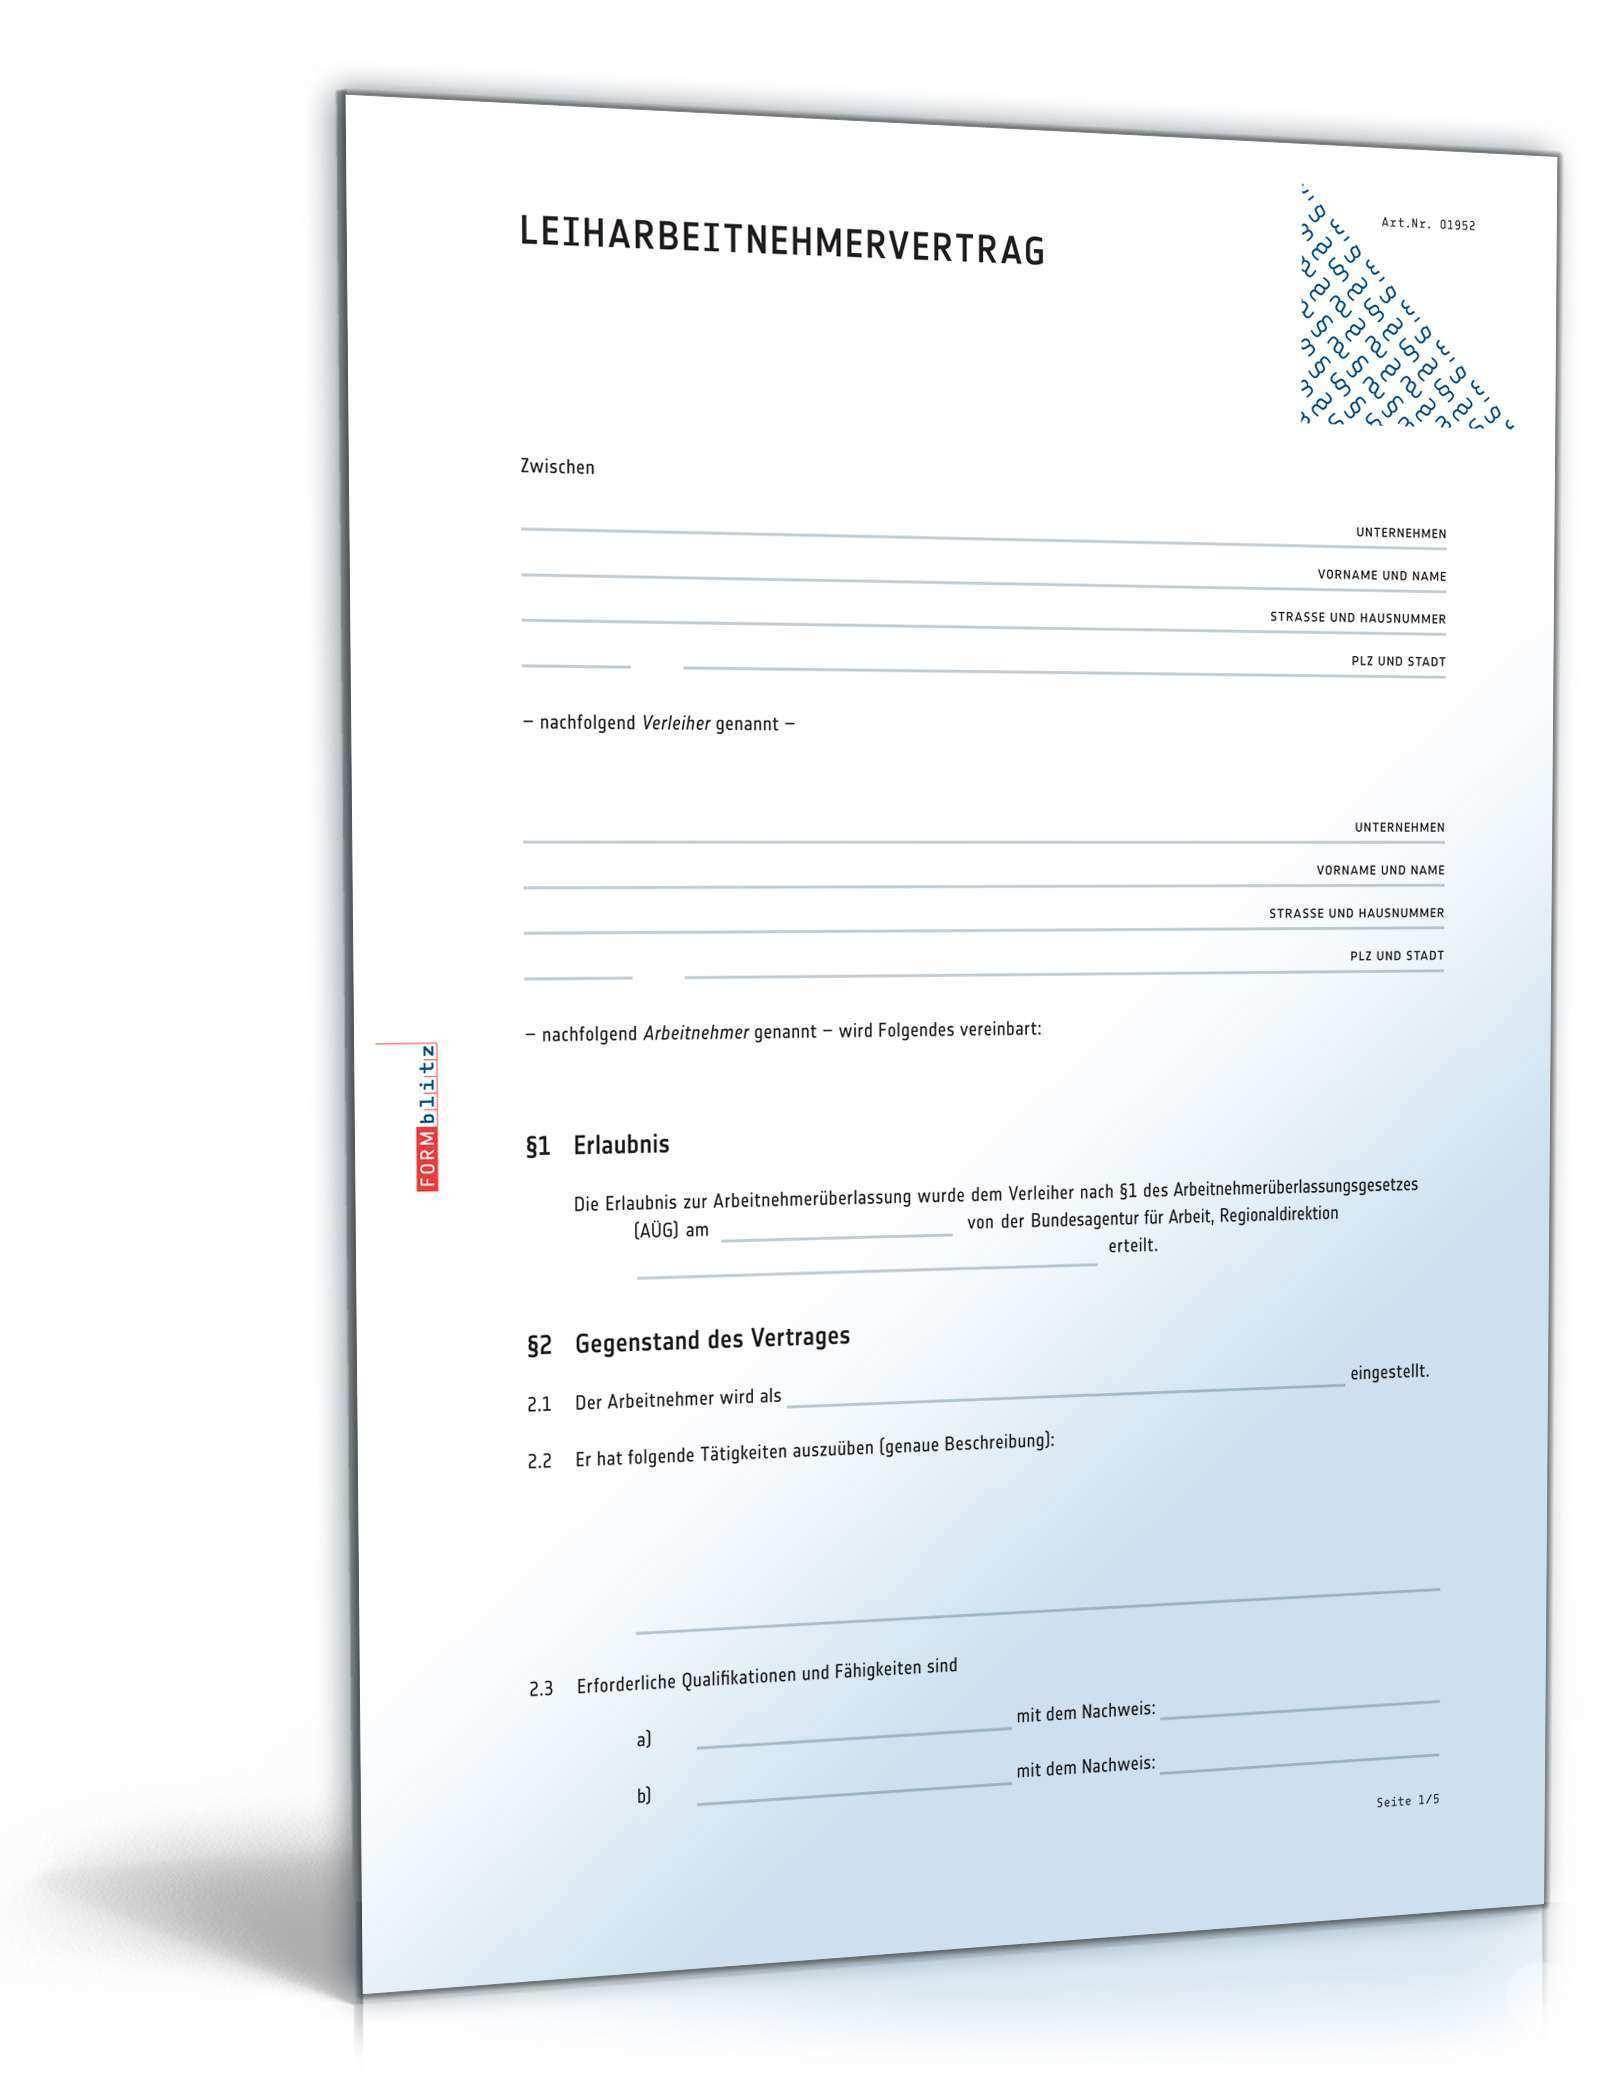 Leiharbeitsvertrag Muster Zum Download